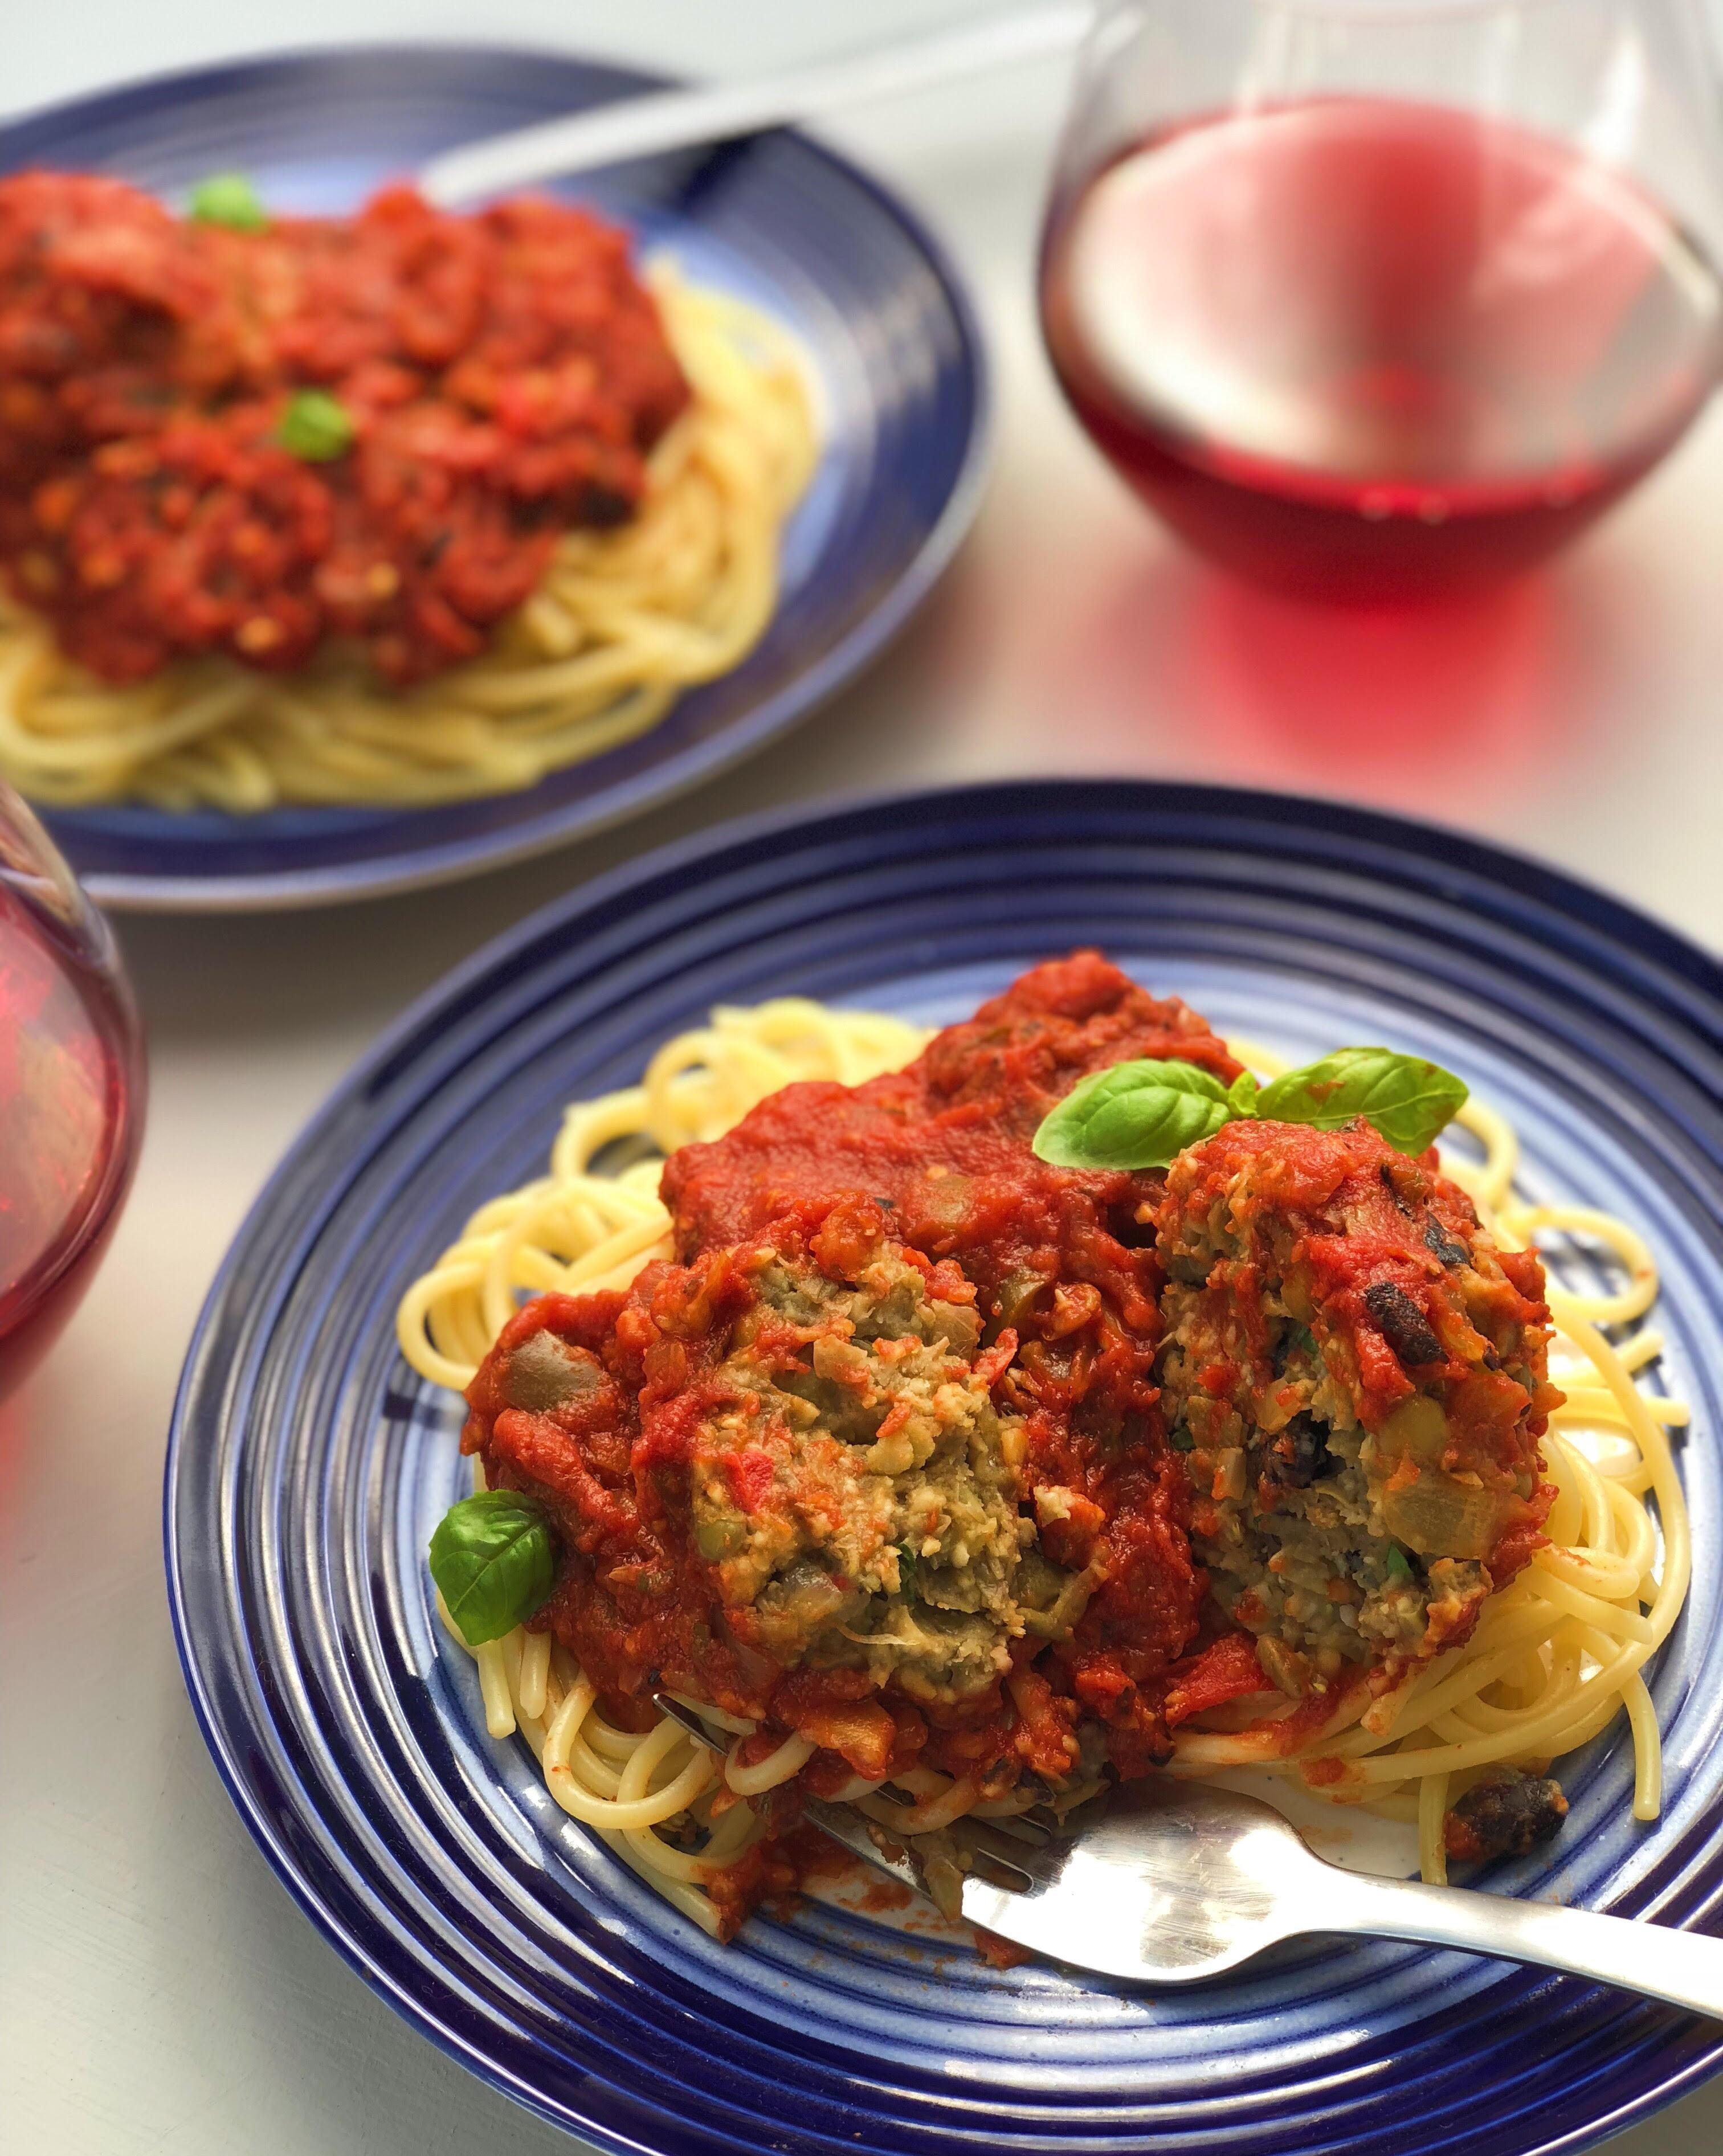 Spaghetti and 'Meatballs'